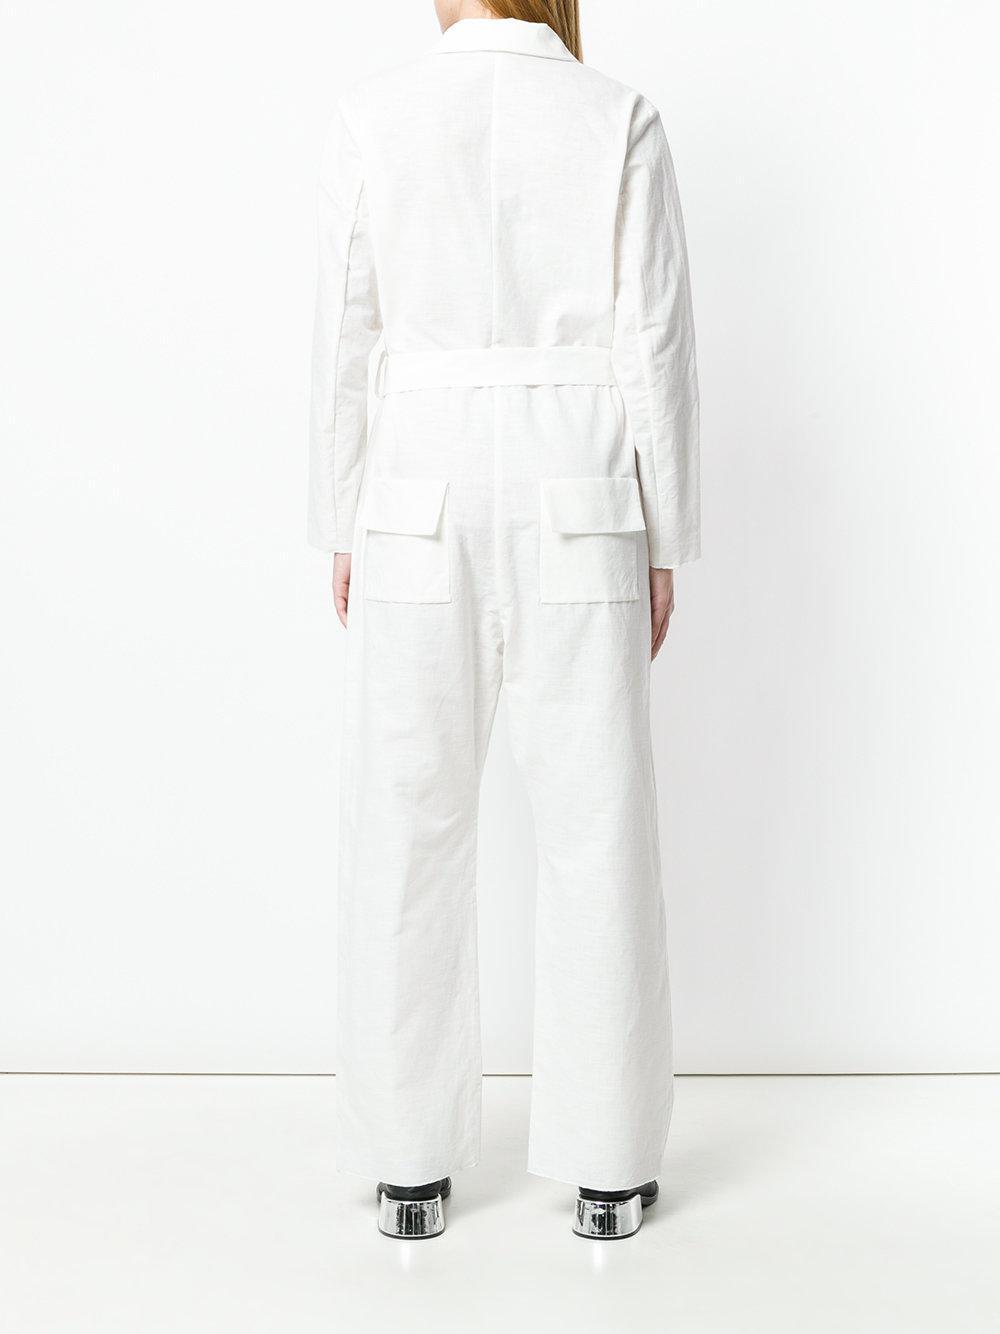 Cherevichkiotvichki Lyst utilidad cinturón blanco Jumpsuit de con 4Srw8Yq4